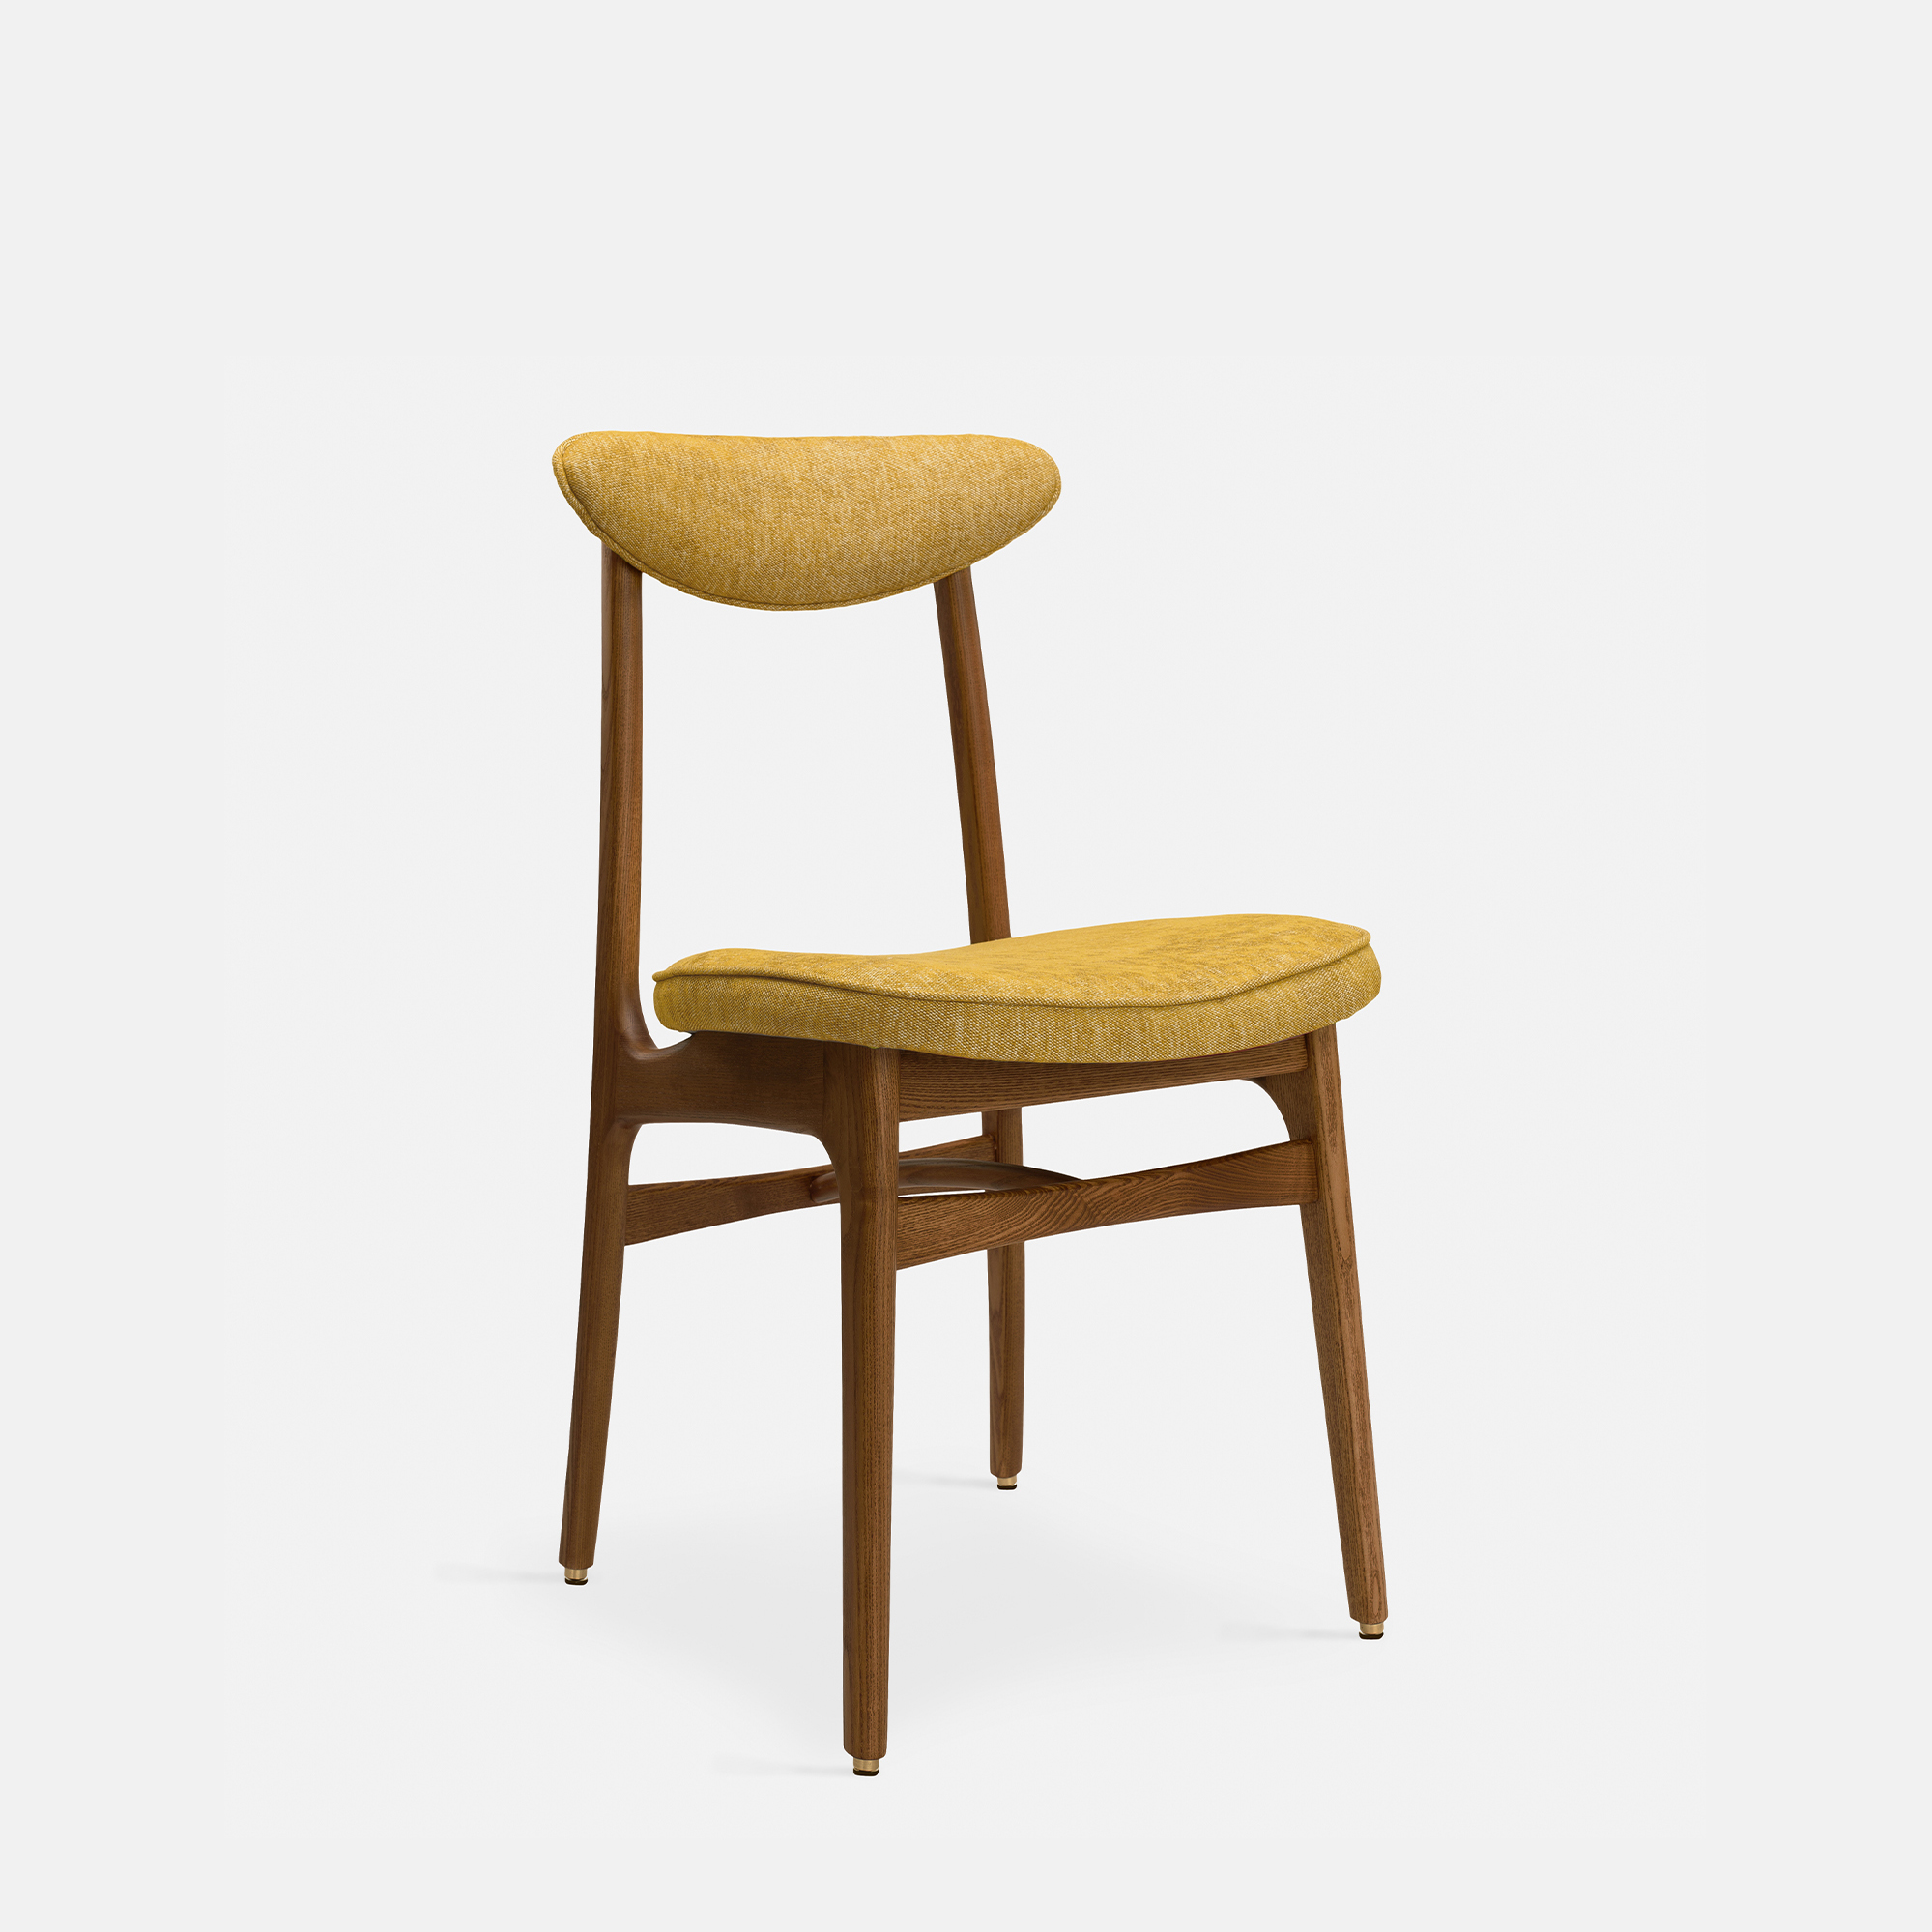 366-Concept-200-190-Chair-W03-Loft-Mustard